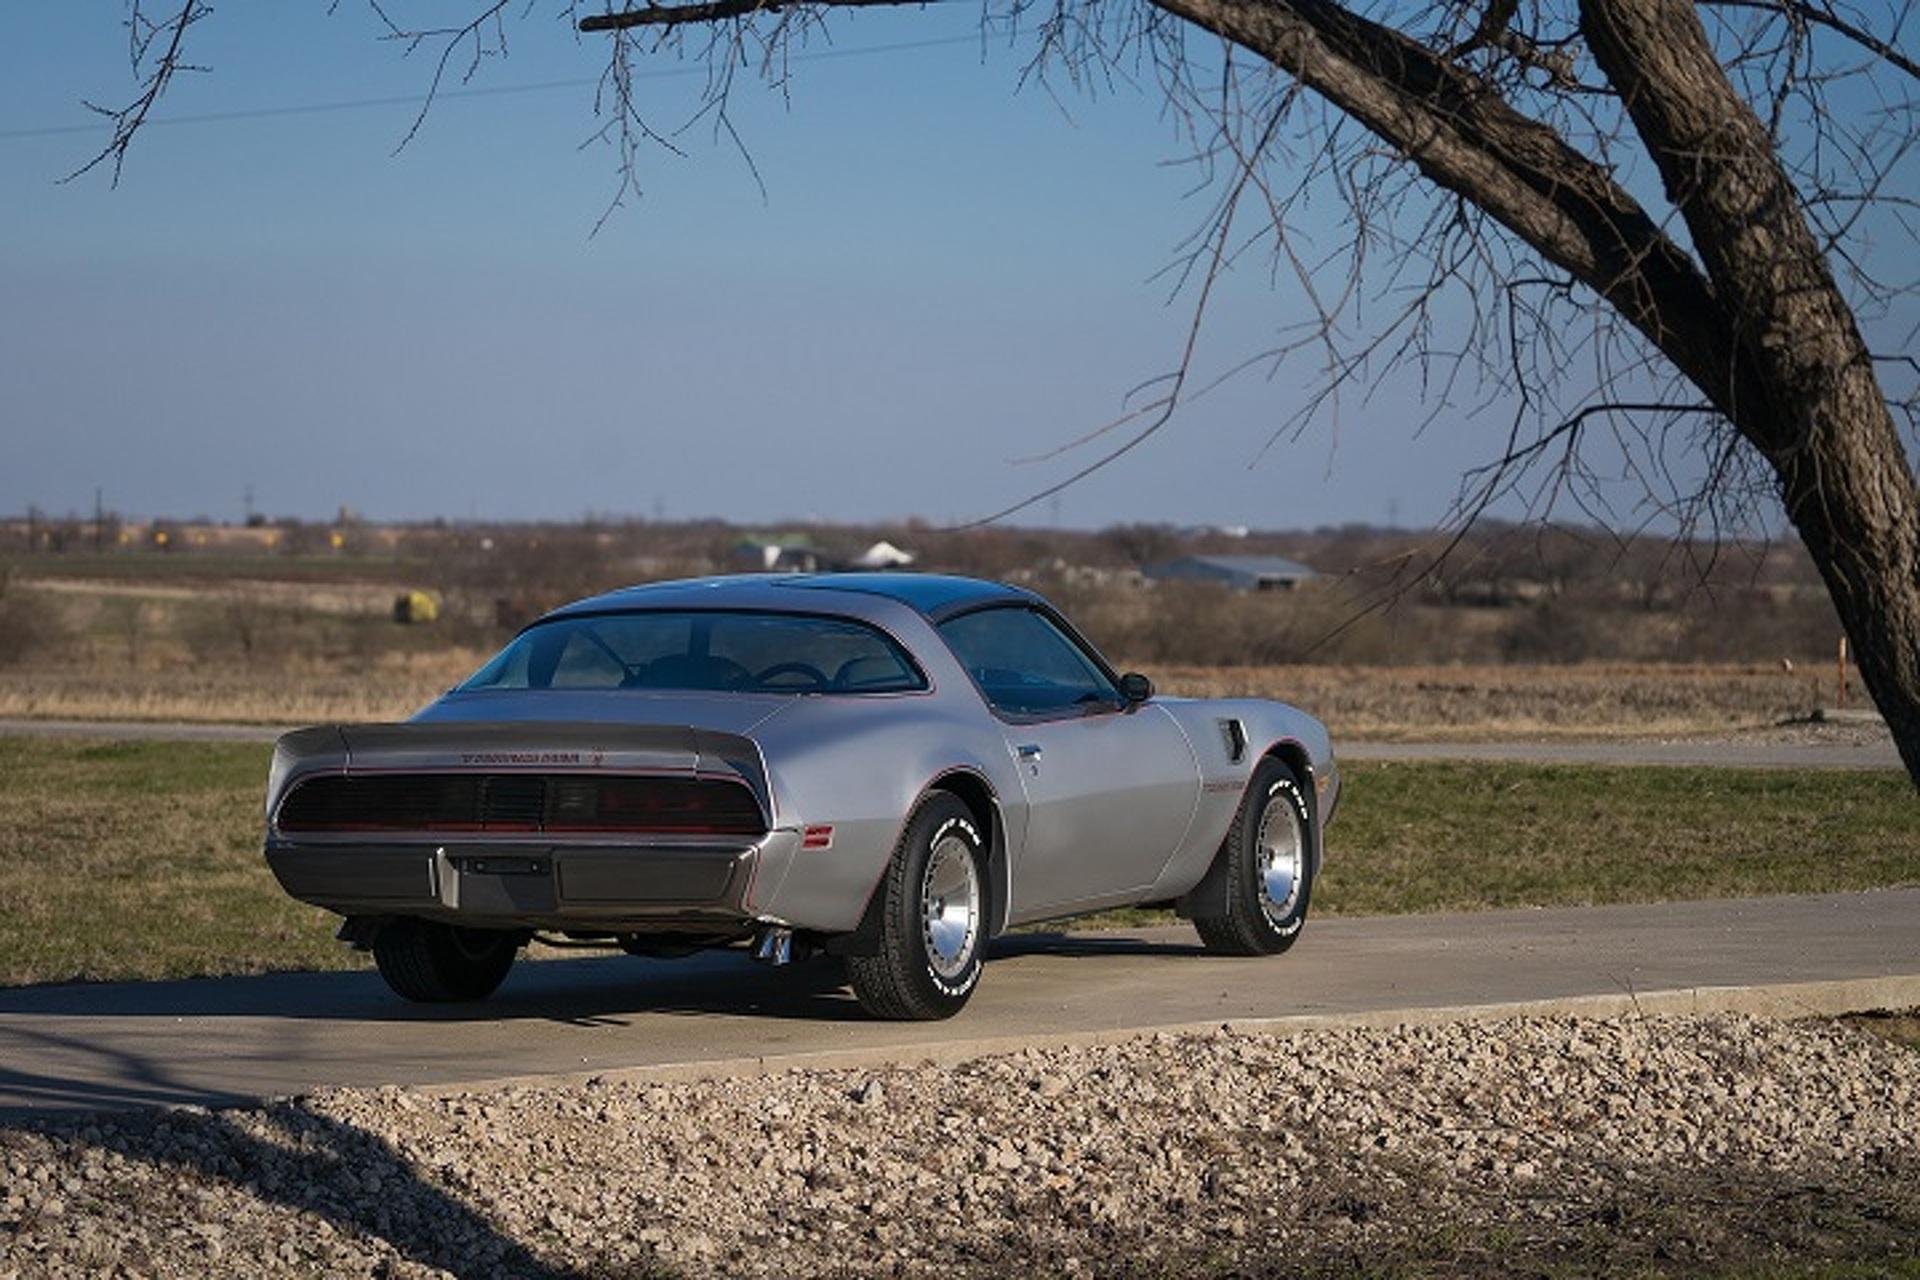 Rare 10th Anniversary 1979 Pontiac Firebird Trans Am Going to Auction